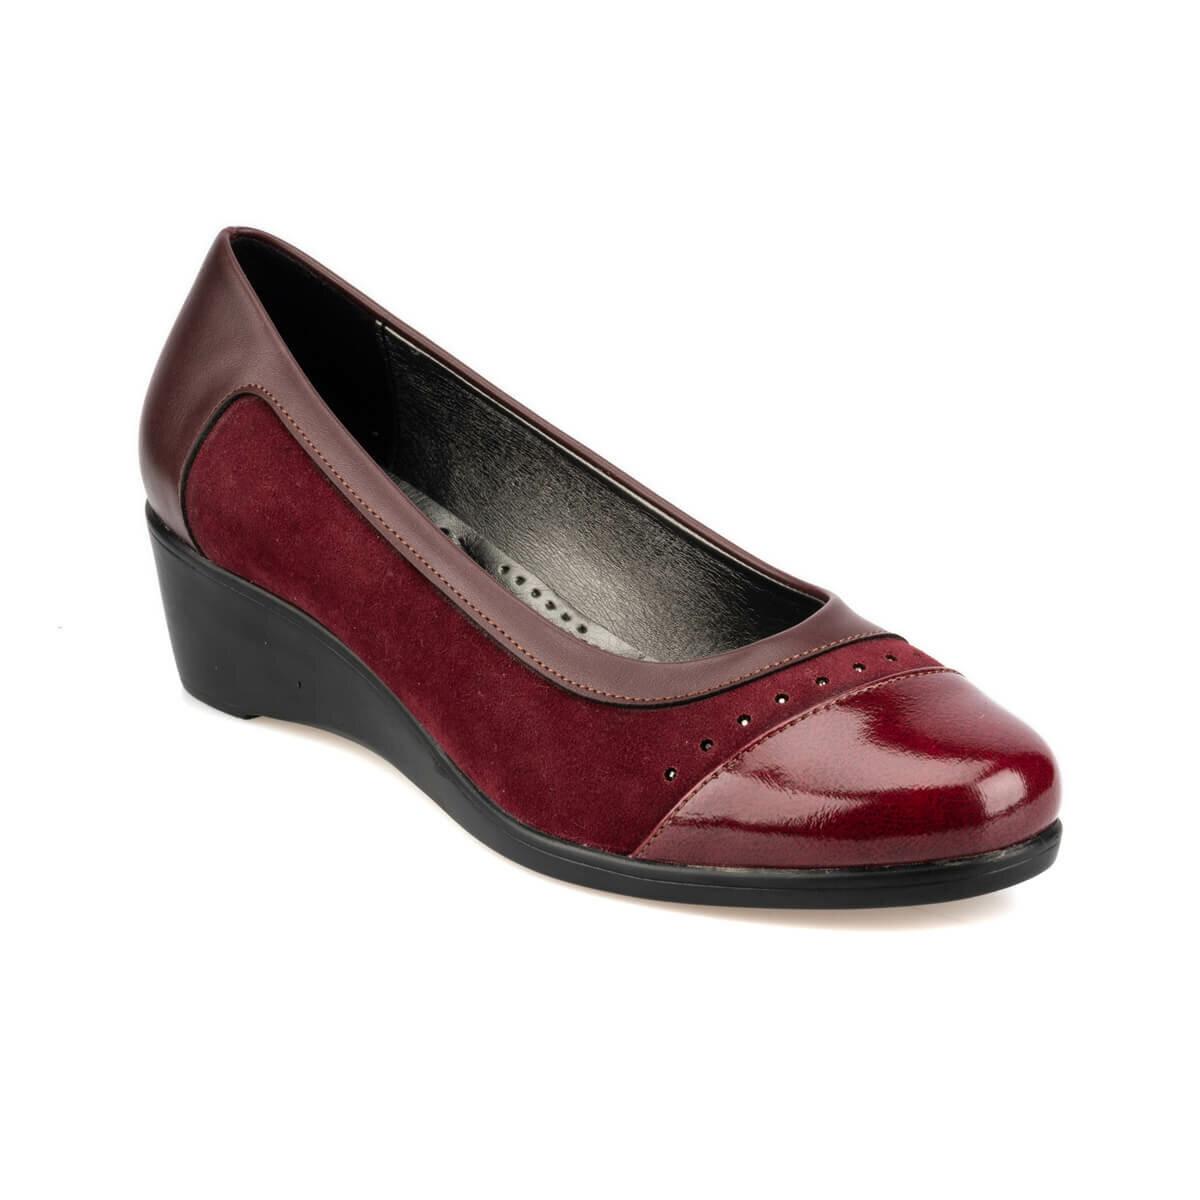 FLO 92.151036.Z Burgundy Women 'S Shoes Polaris